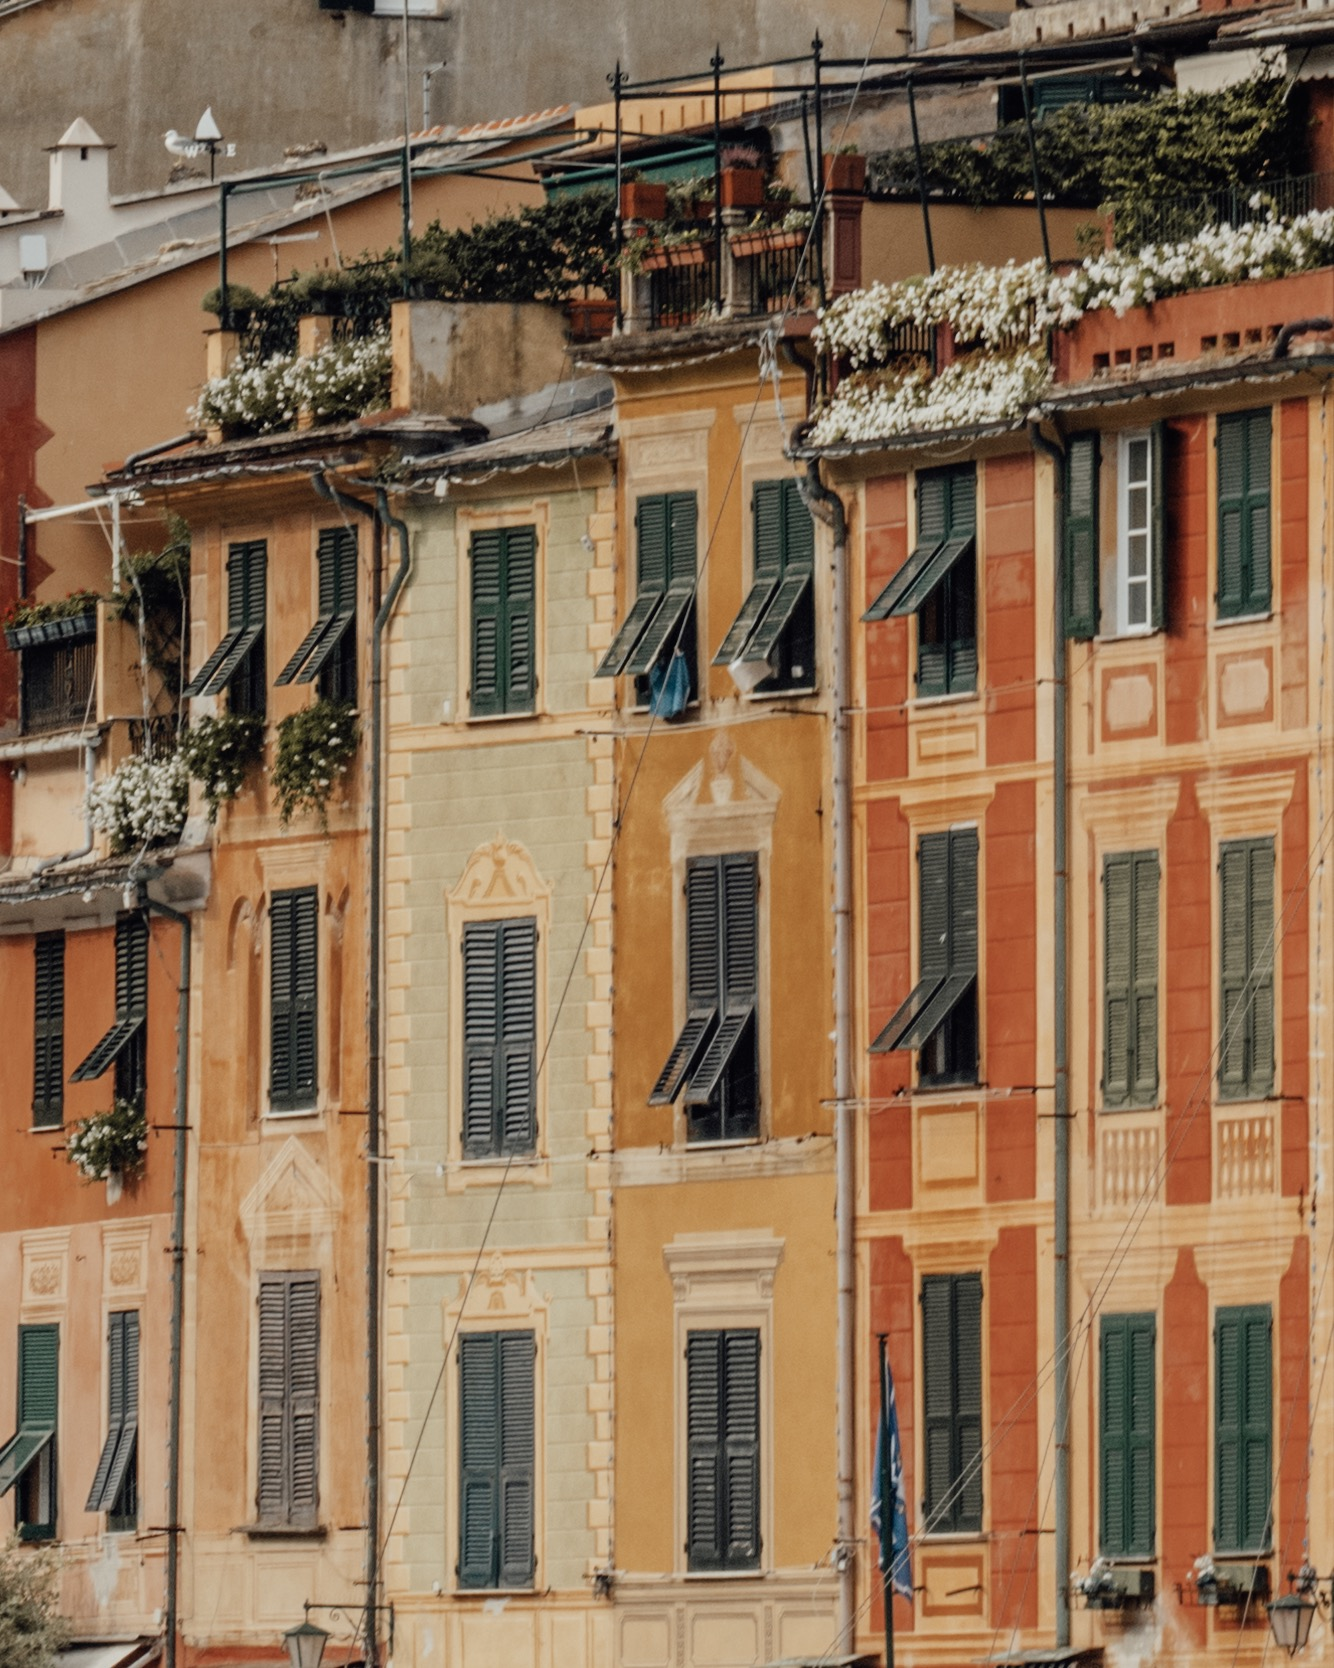 2 Day Ligurian Coast Itinerary   Portofino